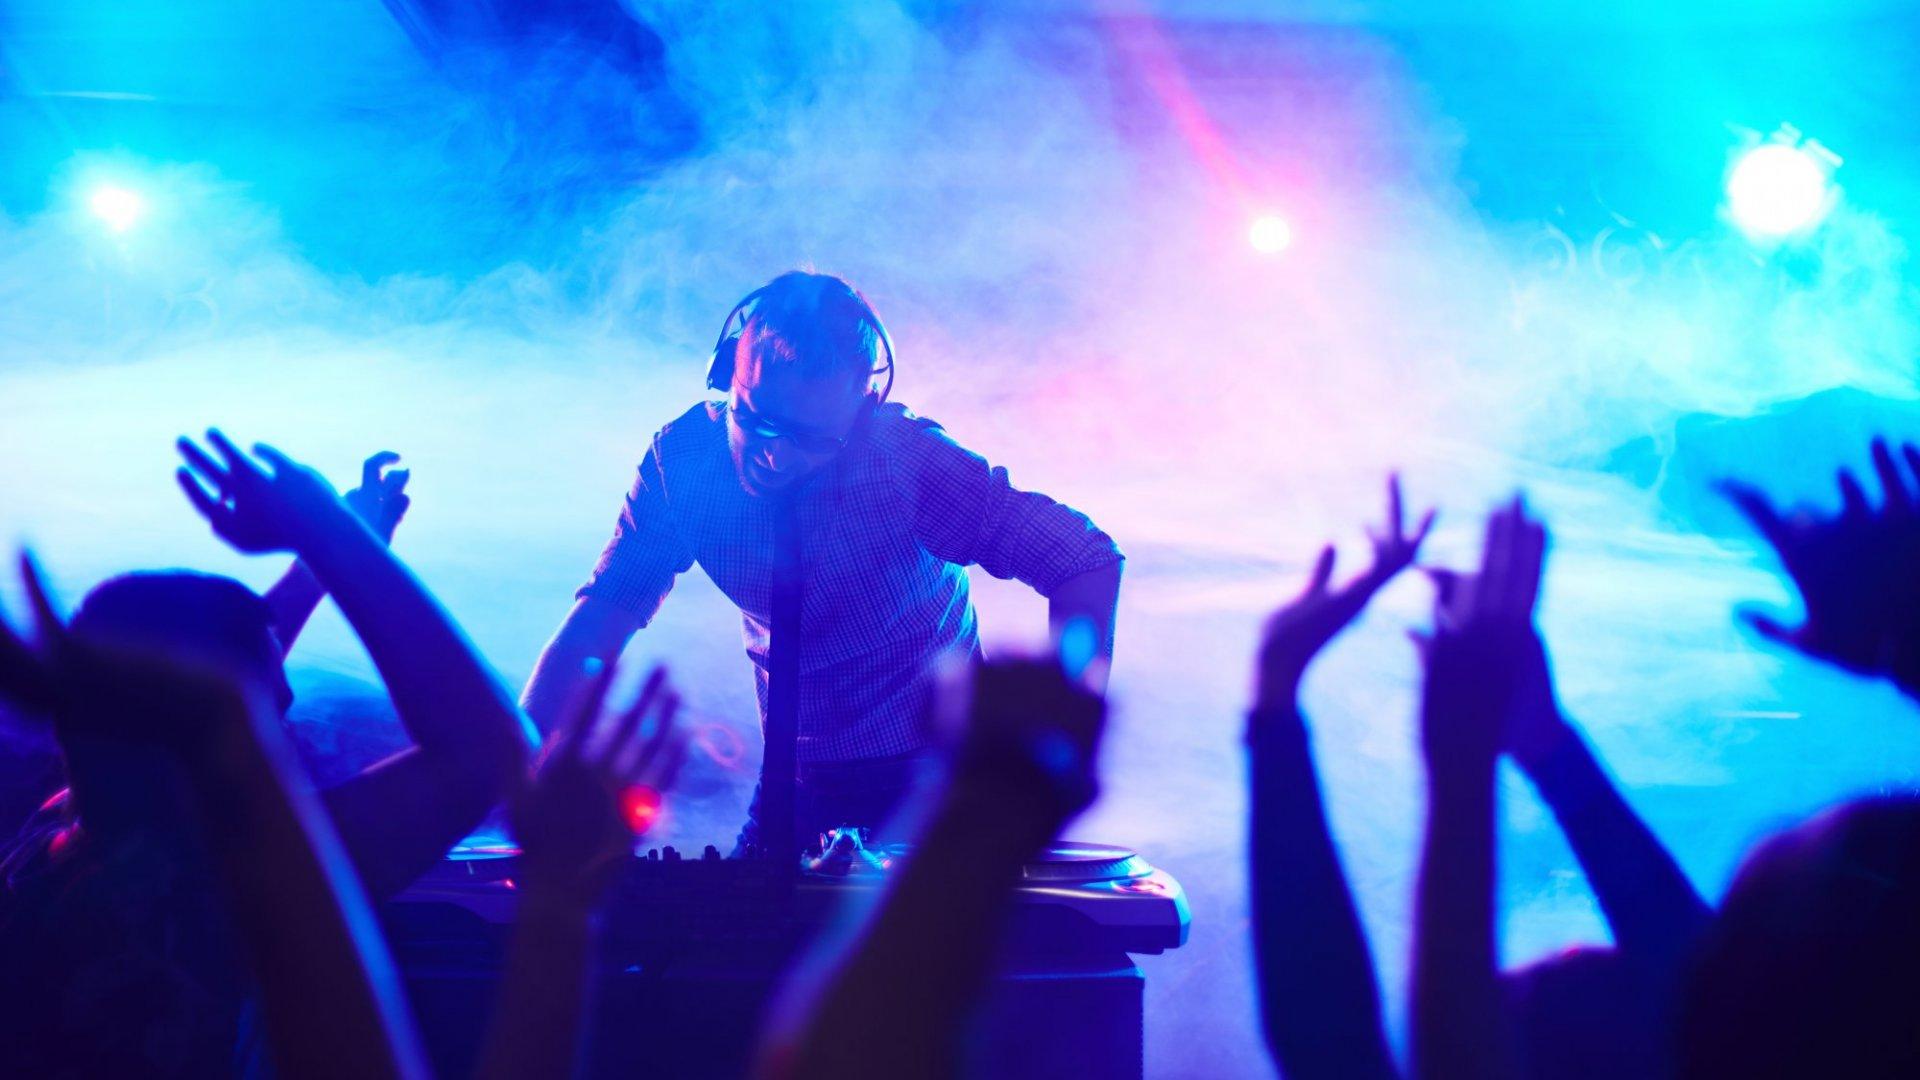 From Iran to Grammy Award-Winning DJ: An Immigrant's True American Success Story